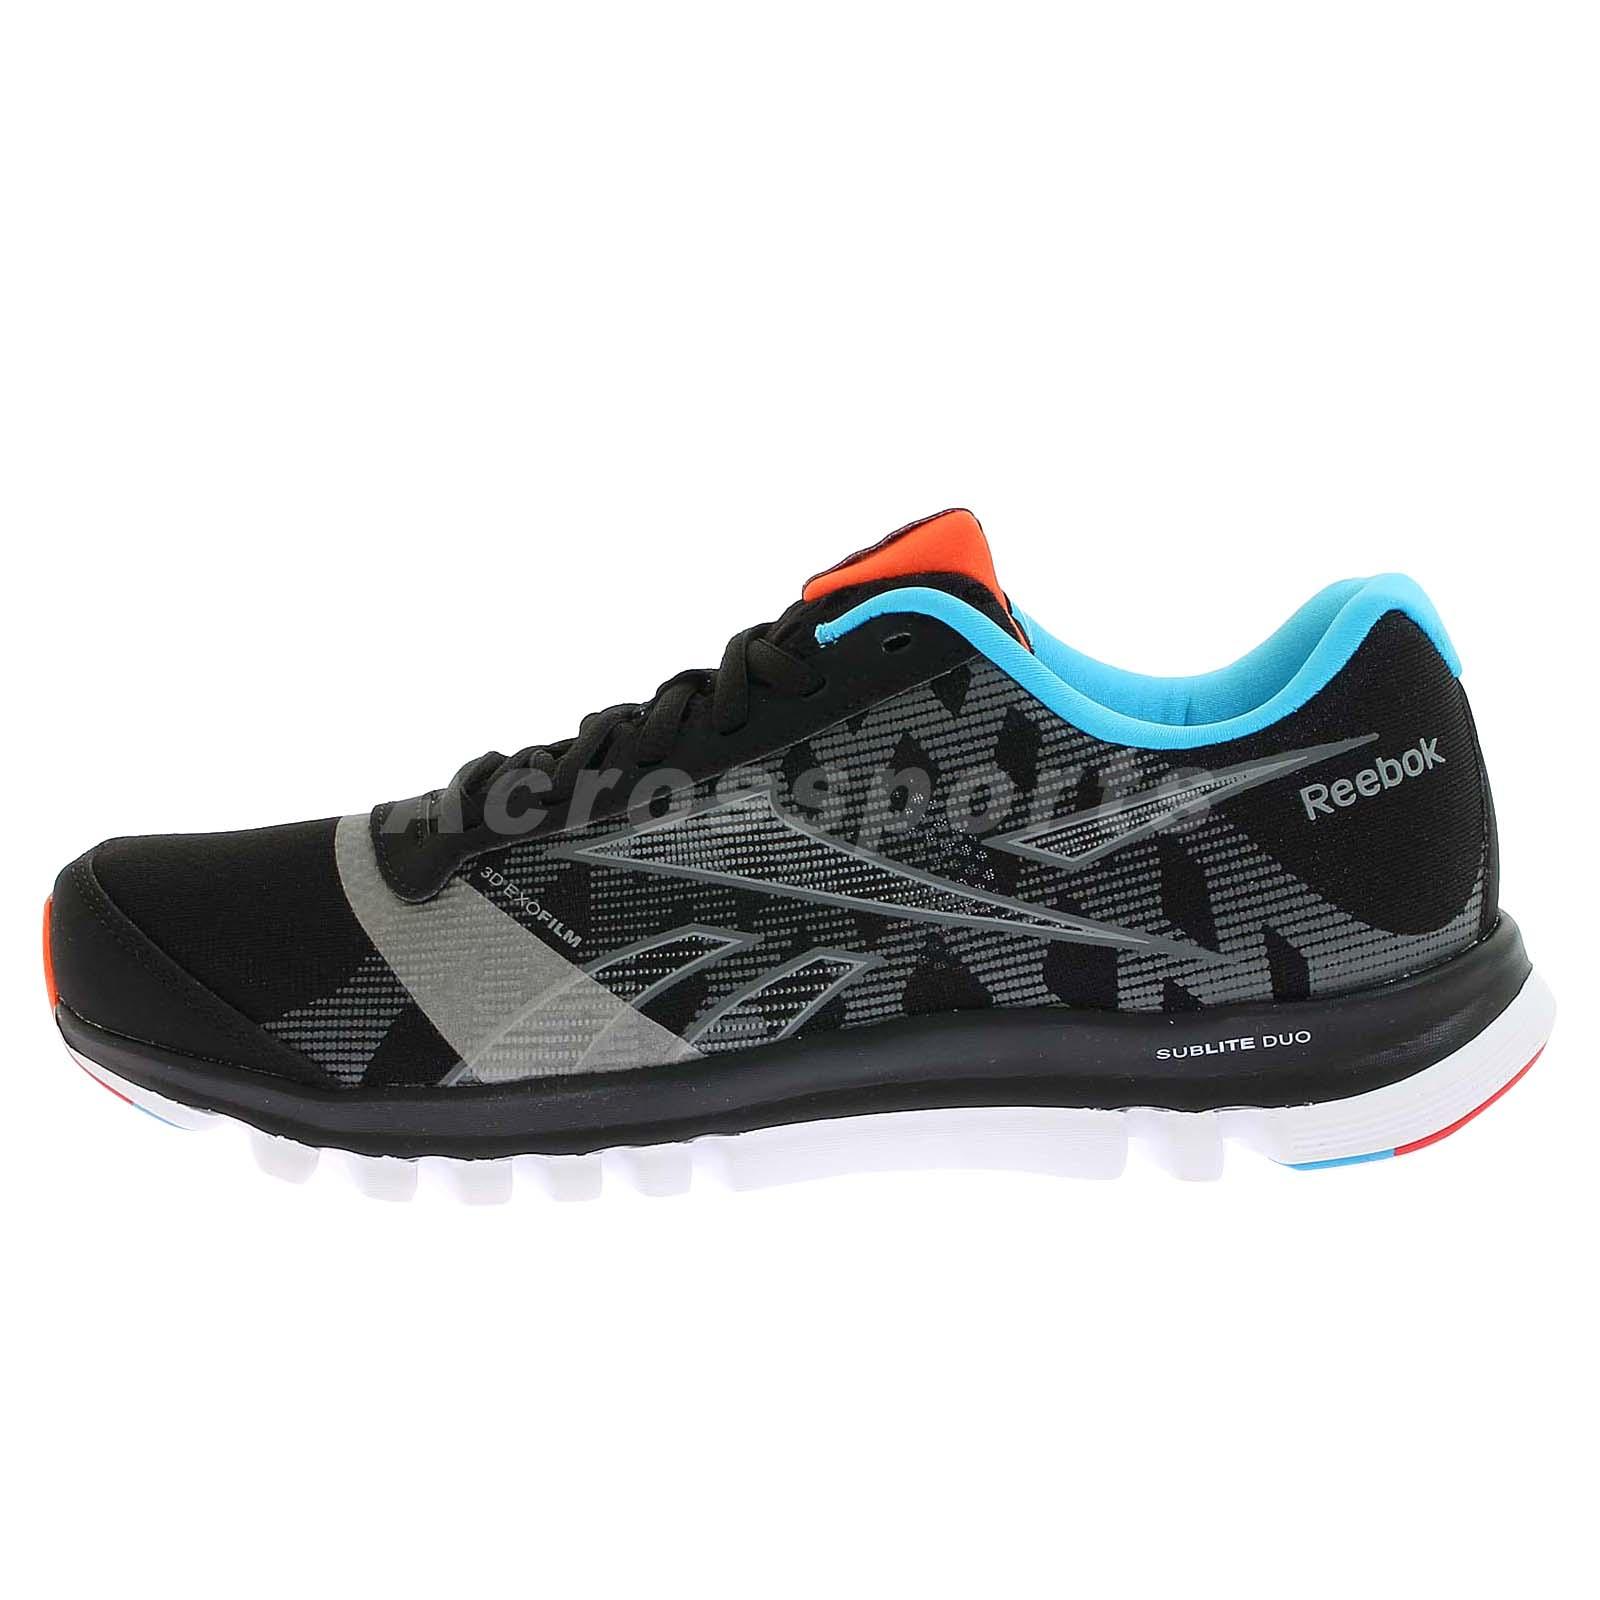 Reebok Running Shoes 2013 Reebok Sublite DUO Cha...